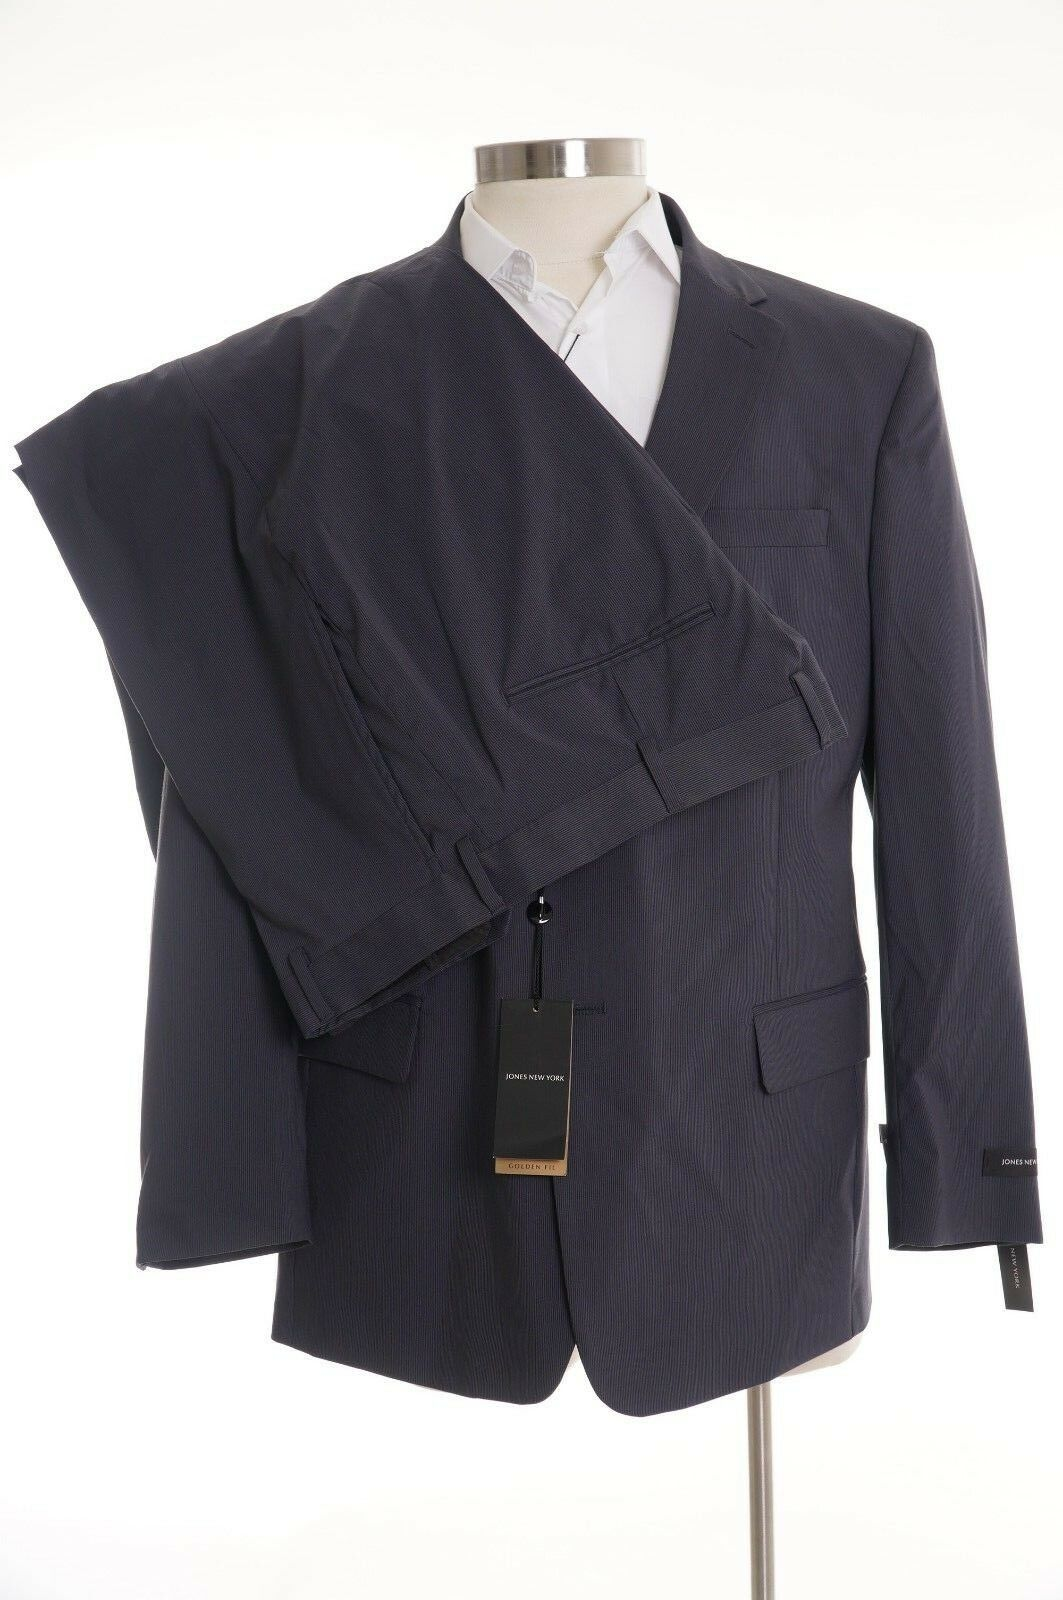 650 Jones New York Classic Fit Blau Tonal Striped 2 Button Suit 40L 33.5W